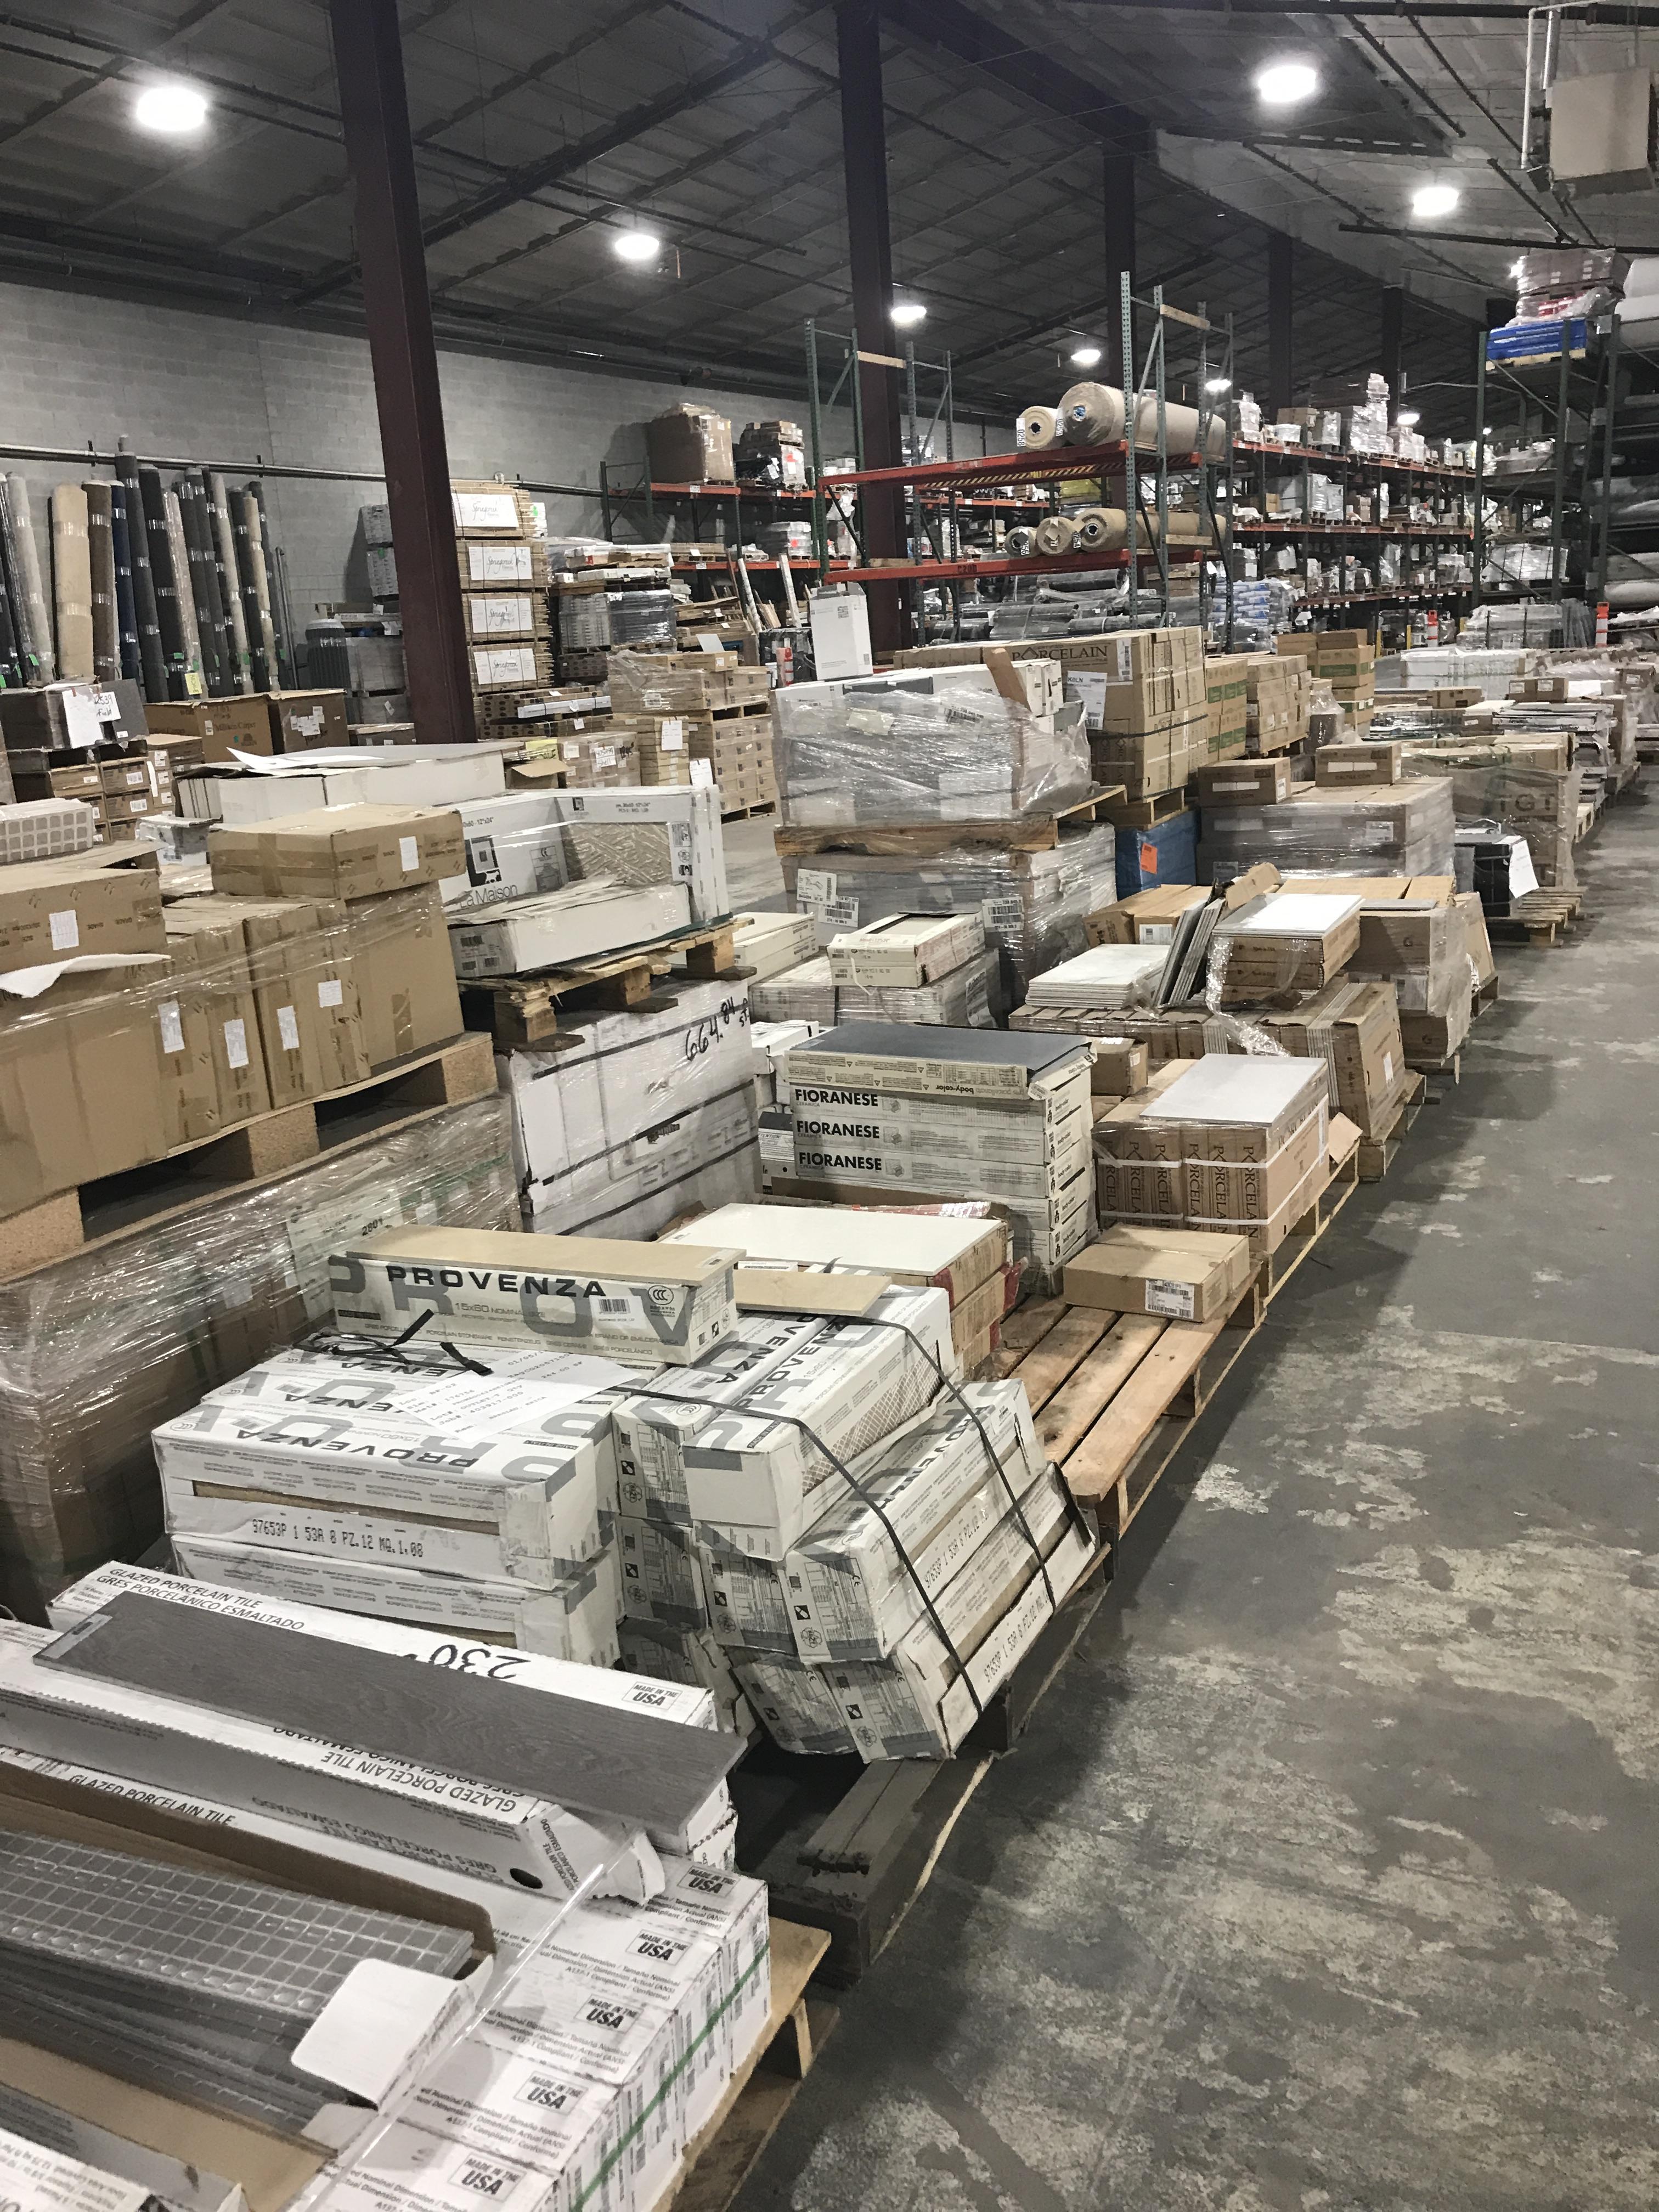 Floors Etc Outlet 9603 Deereco Rd Suite 200 Lutherville Timonium MD 21093